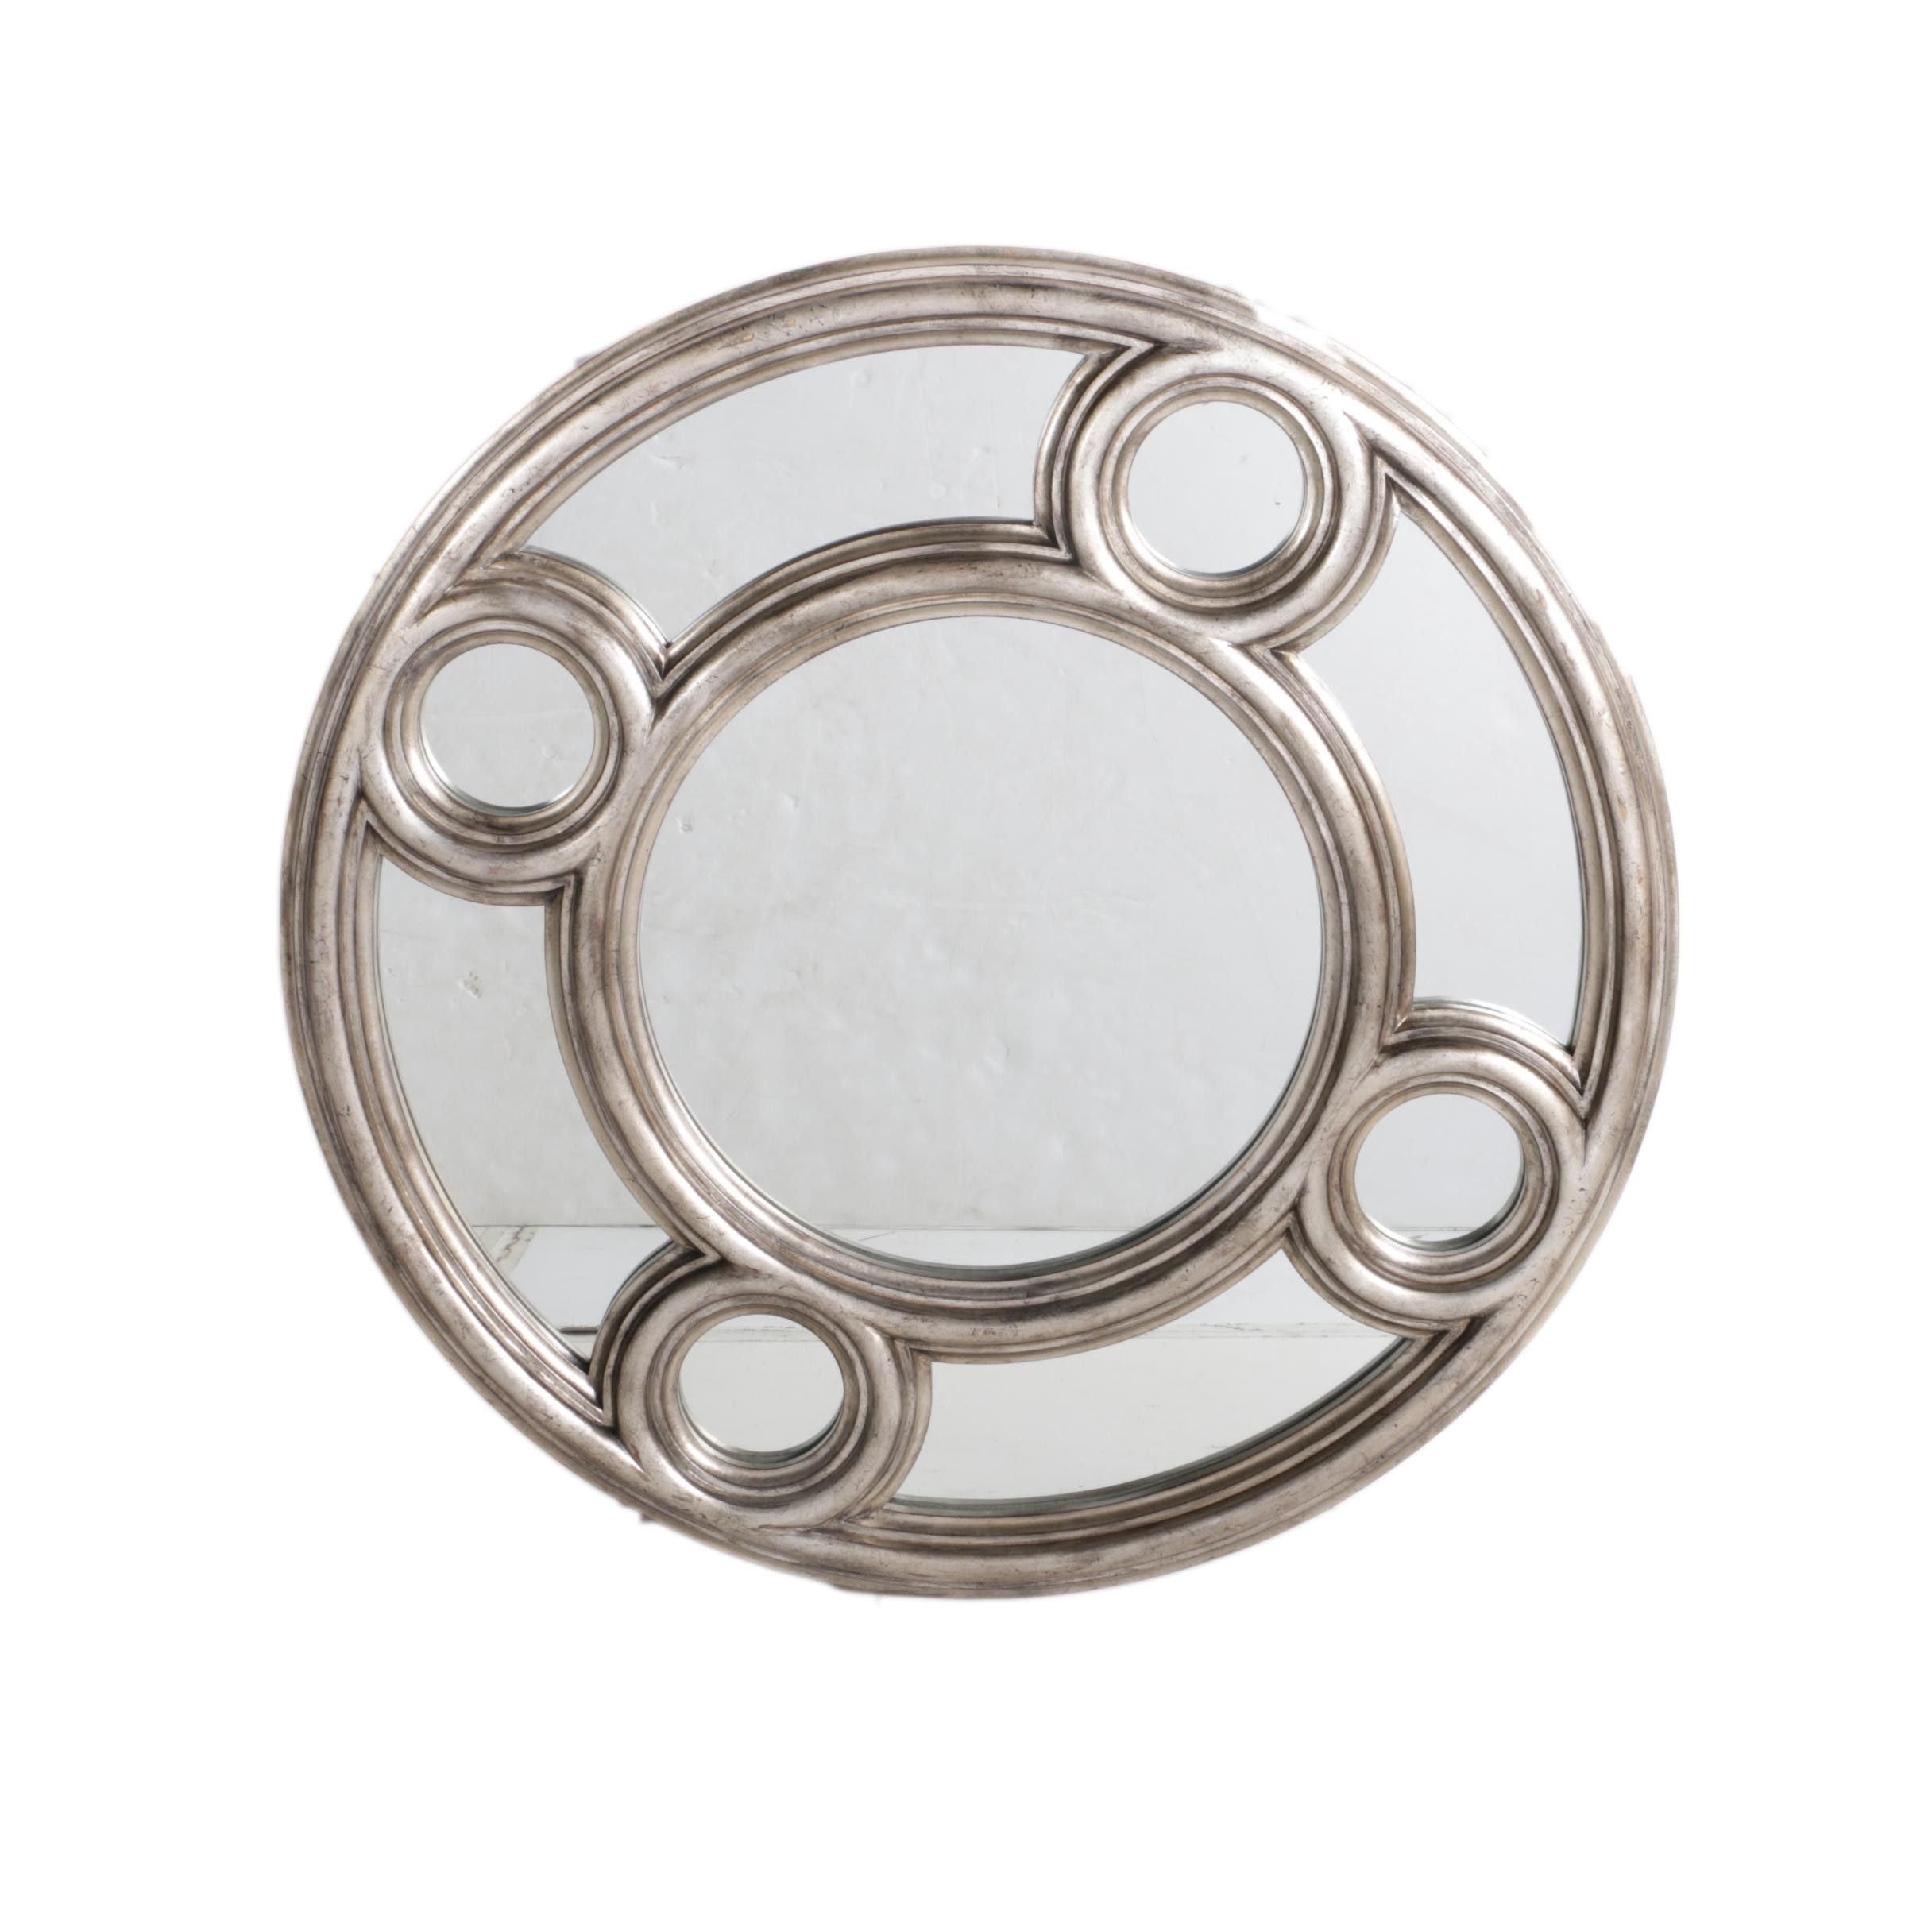 Baker Furniture Circular Wall Mirror